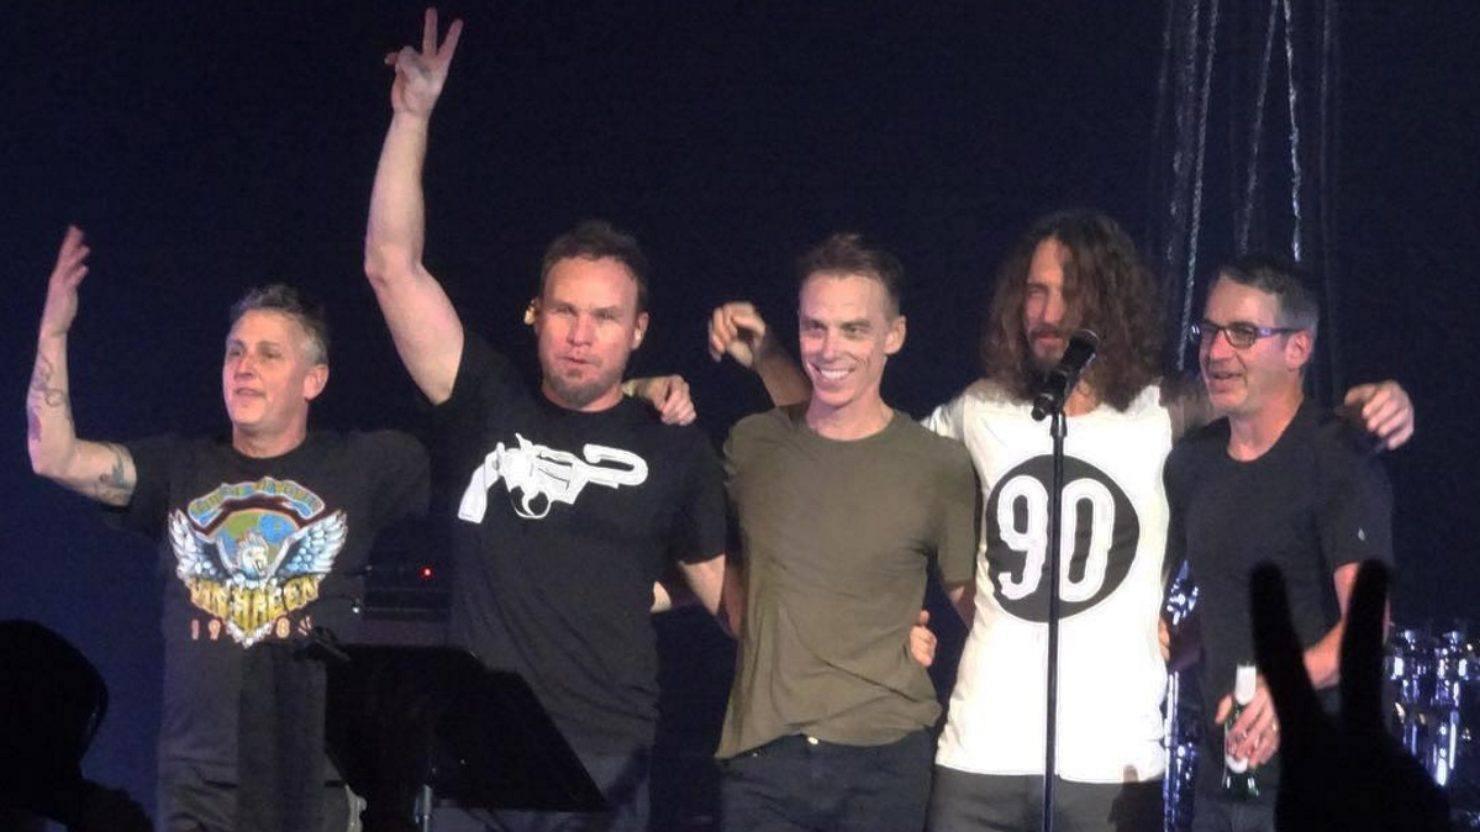 Eddie Vedder And Chris Cornell Multi-Cam Video: Templ...